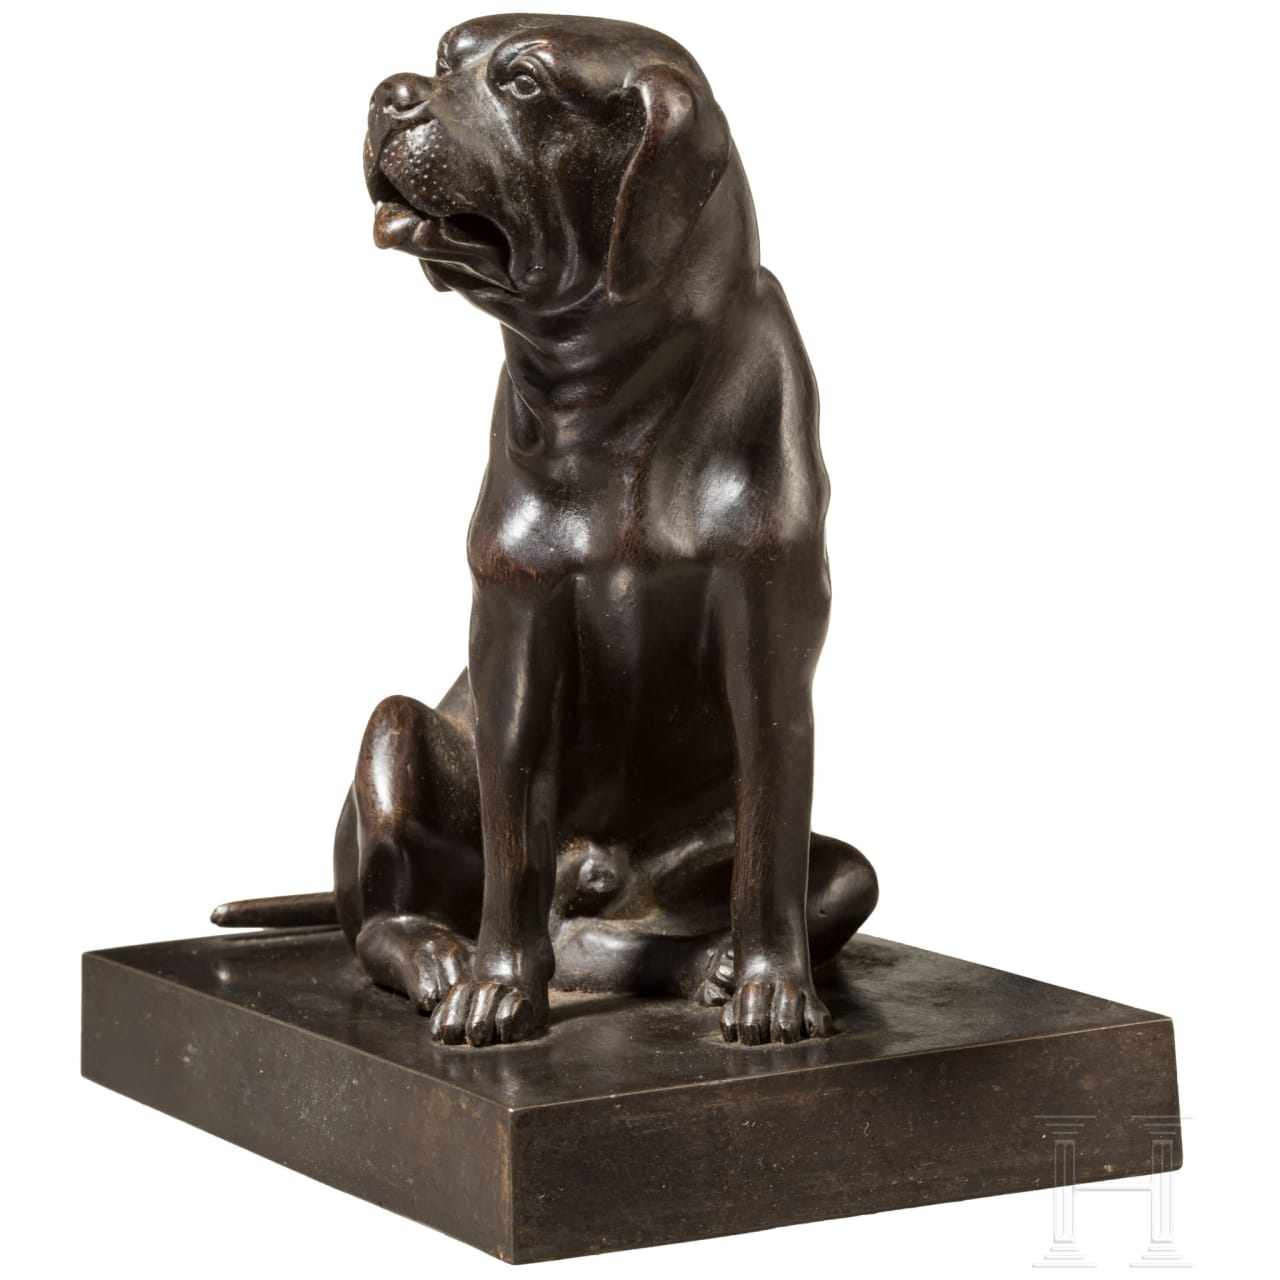 A Russian iron sculpture of a sitting dog as a card holder, Kasli, 19th century